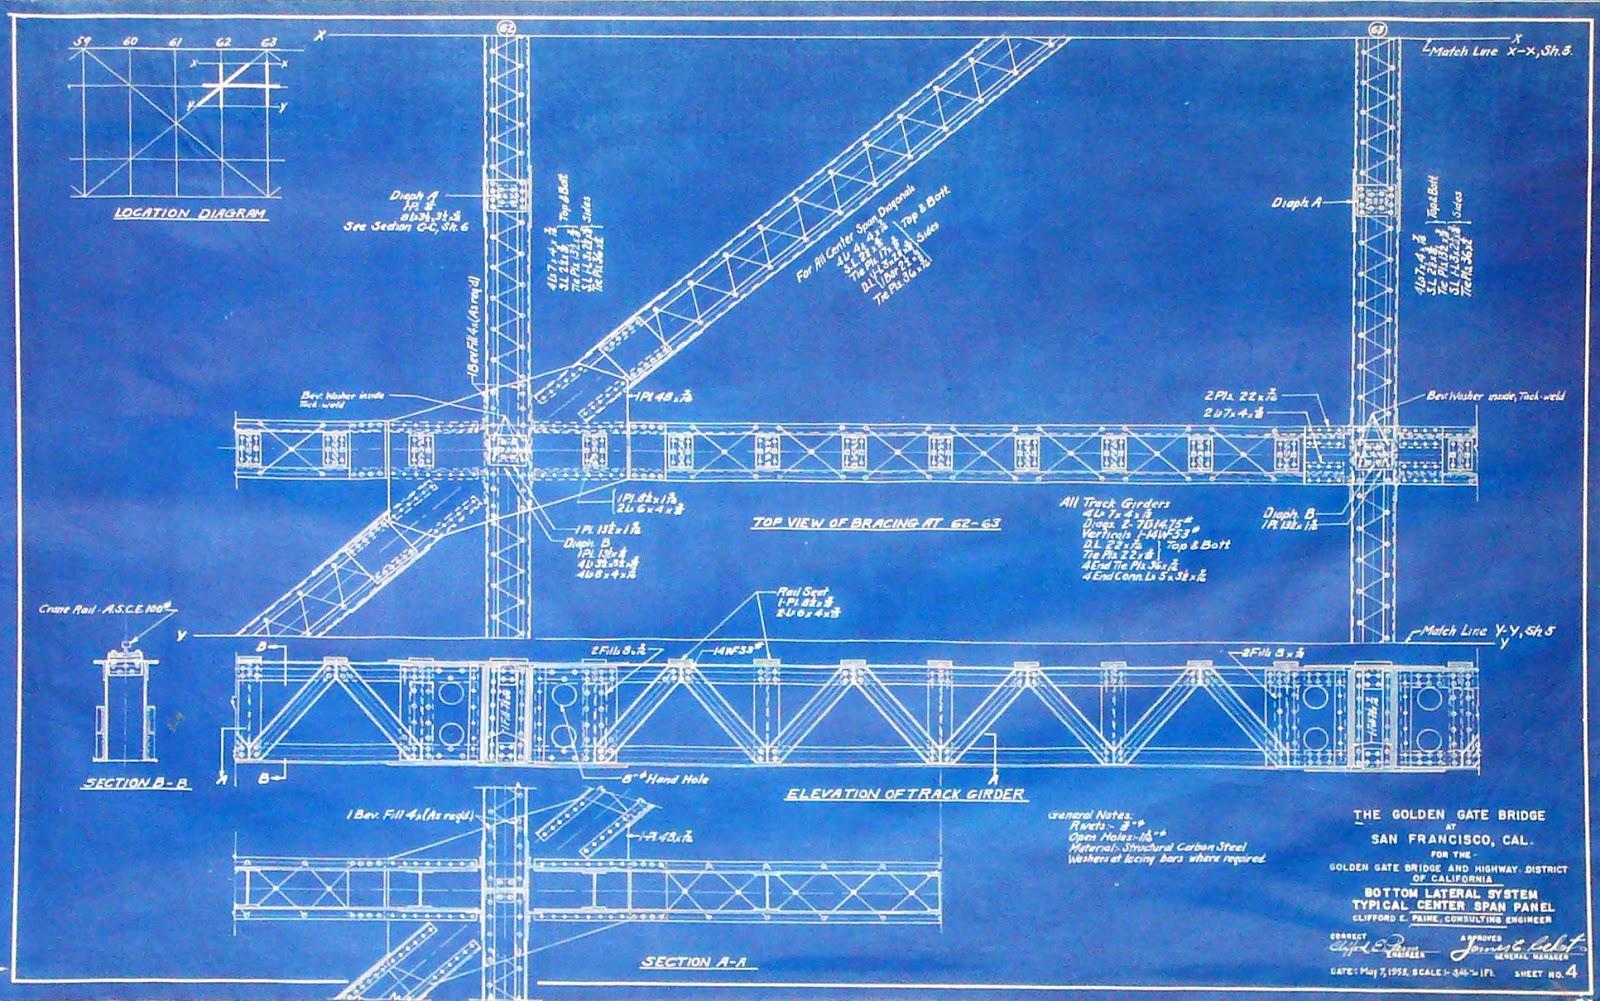 blueprint blueprints bridge building structure builder gate golden architectural arader plans landmark progress adaptation climate three something galleries pages structures